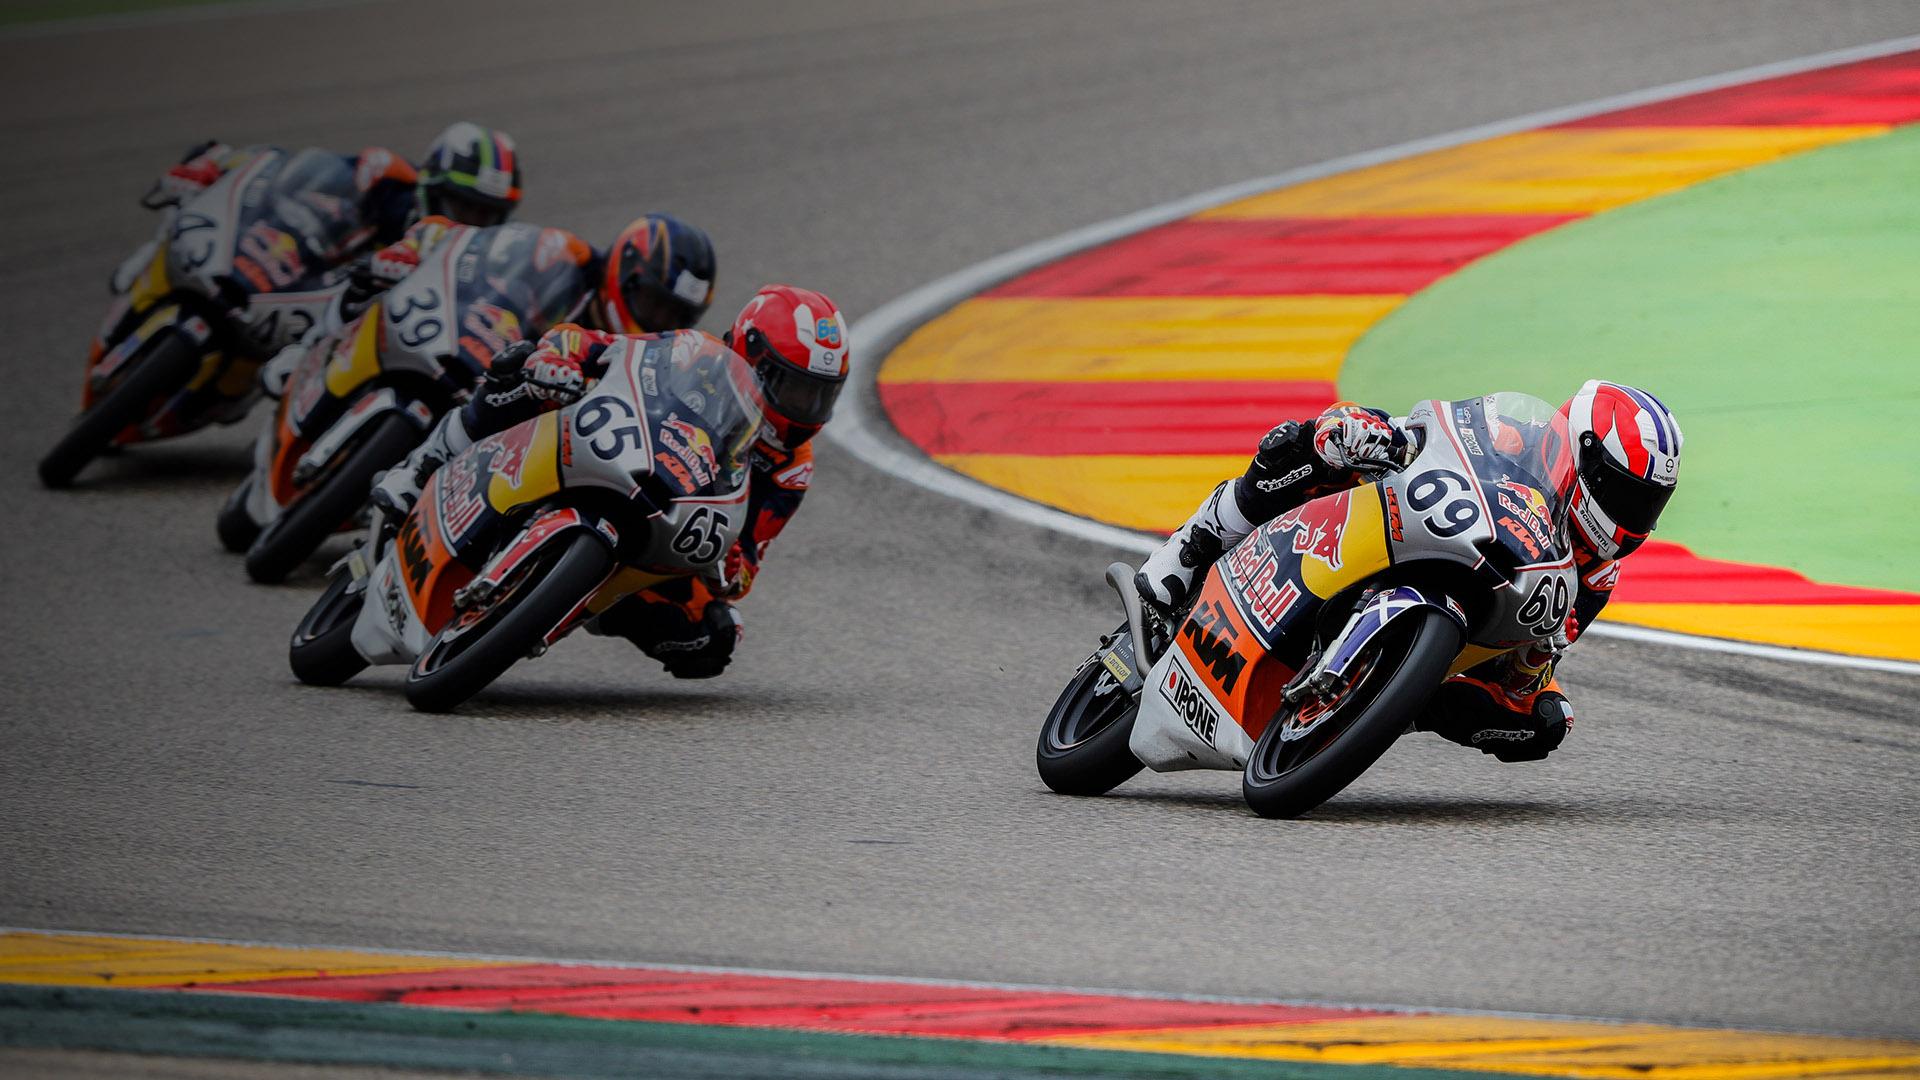 Acompañando a la Red Bull MotoGP Rookies Cup